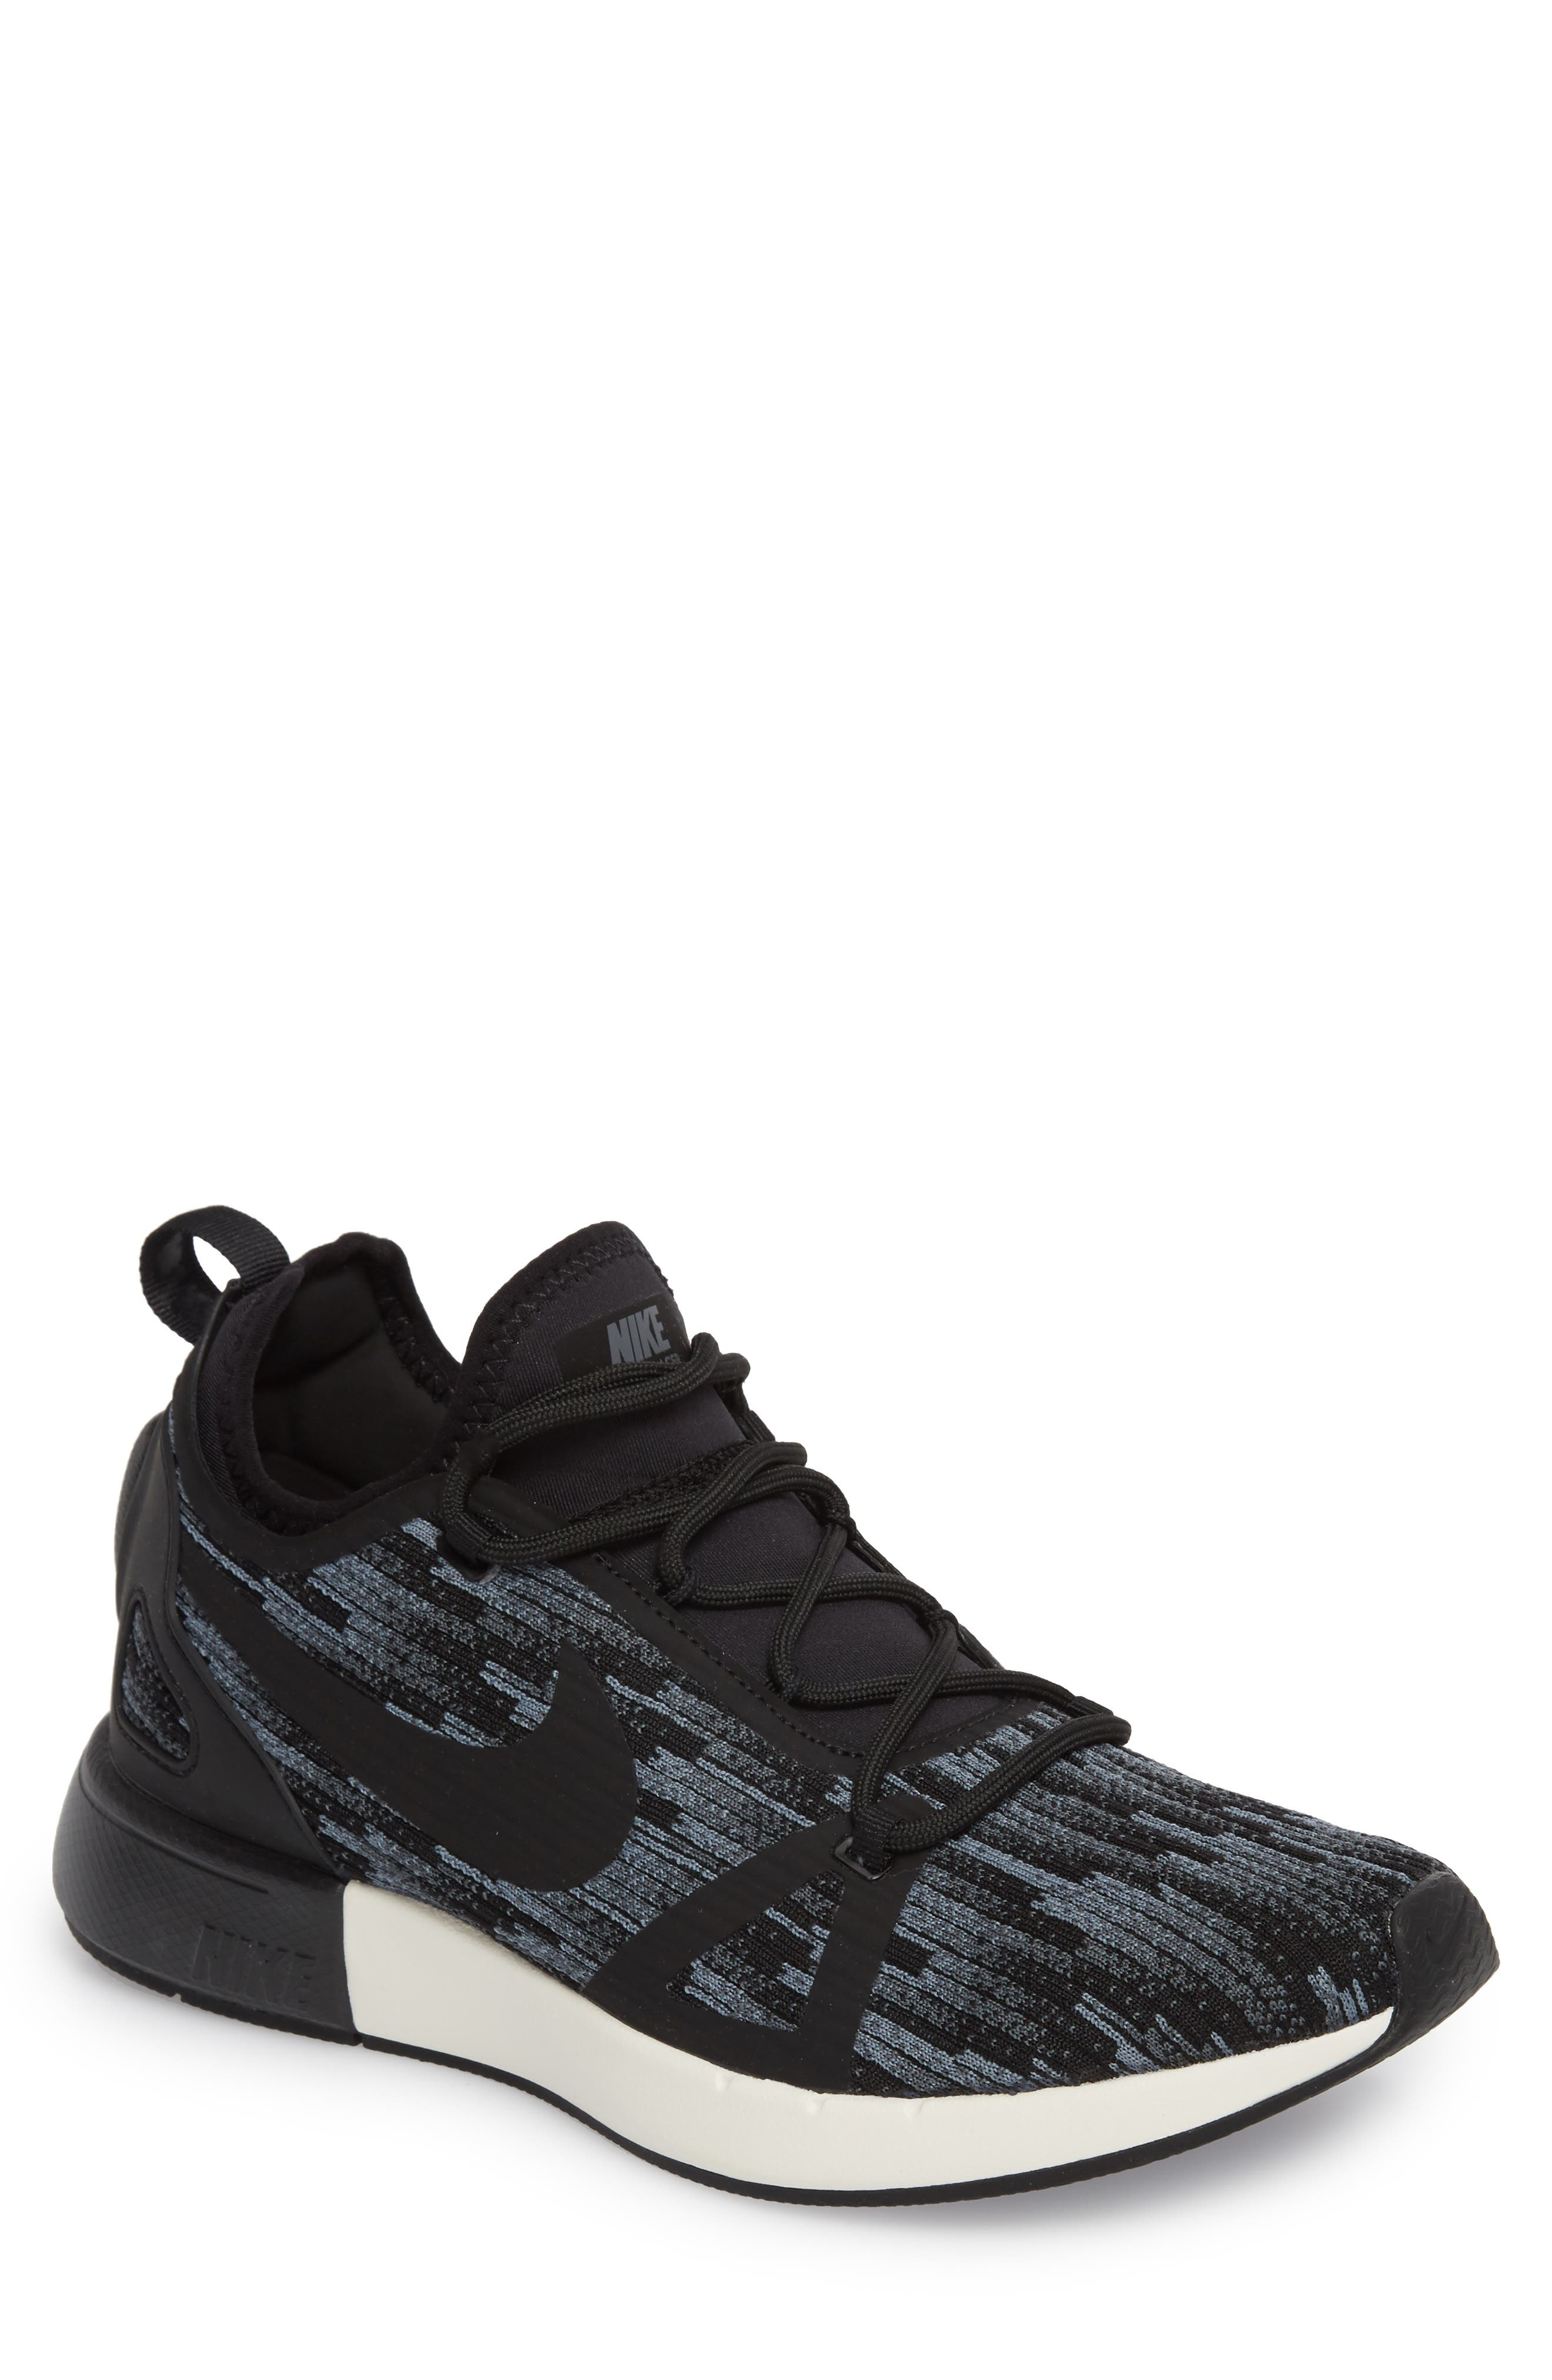 Duel Racer SE Knit Sneaker,                             Main thumbnail 1, color,                             020